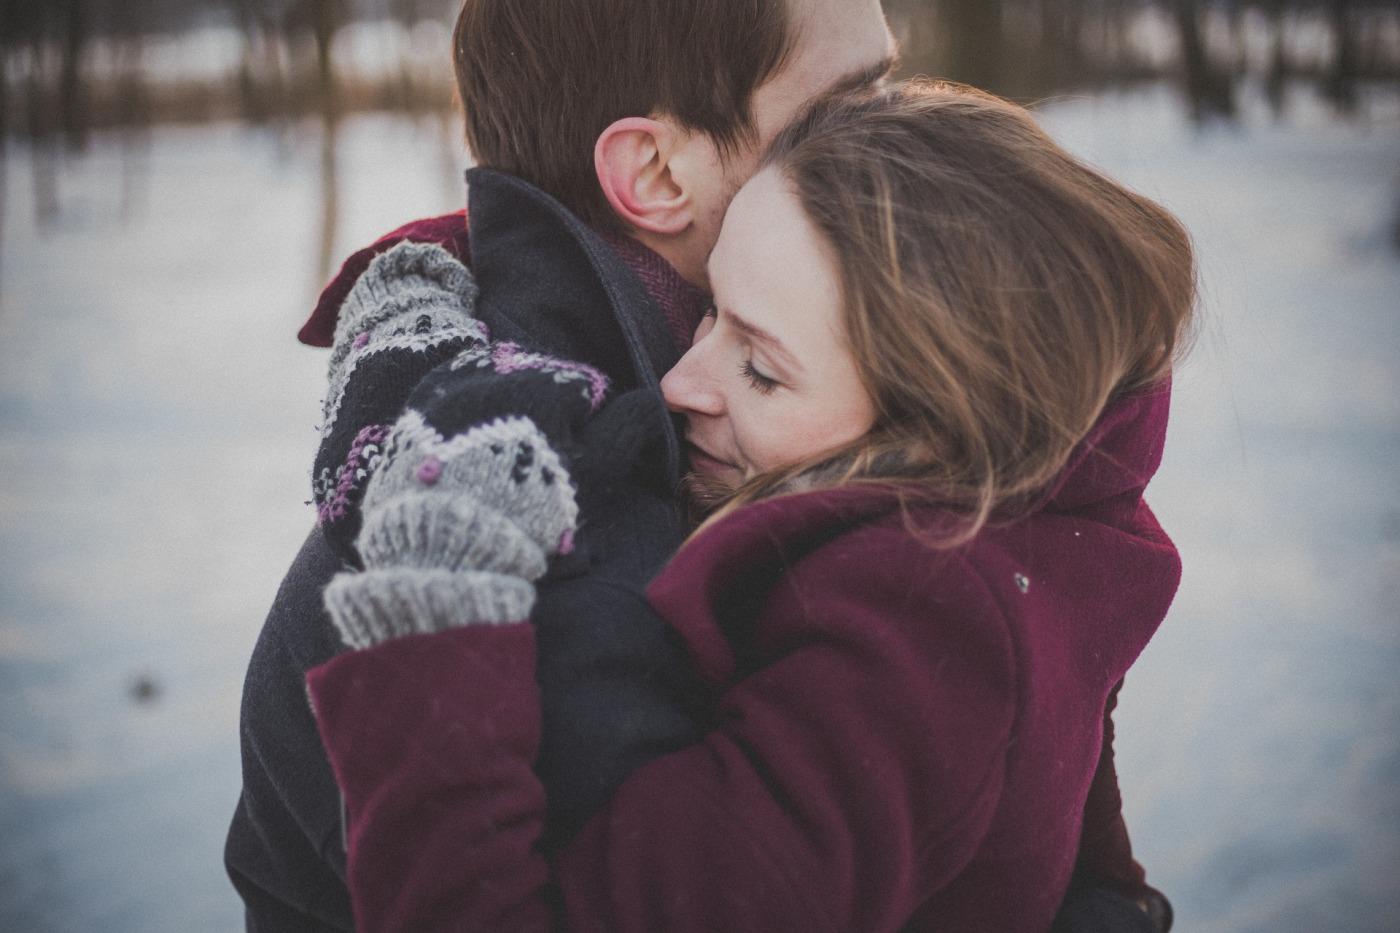 Hugs - Bodily autonomy - Respect - Holidays